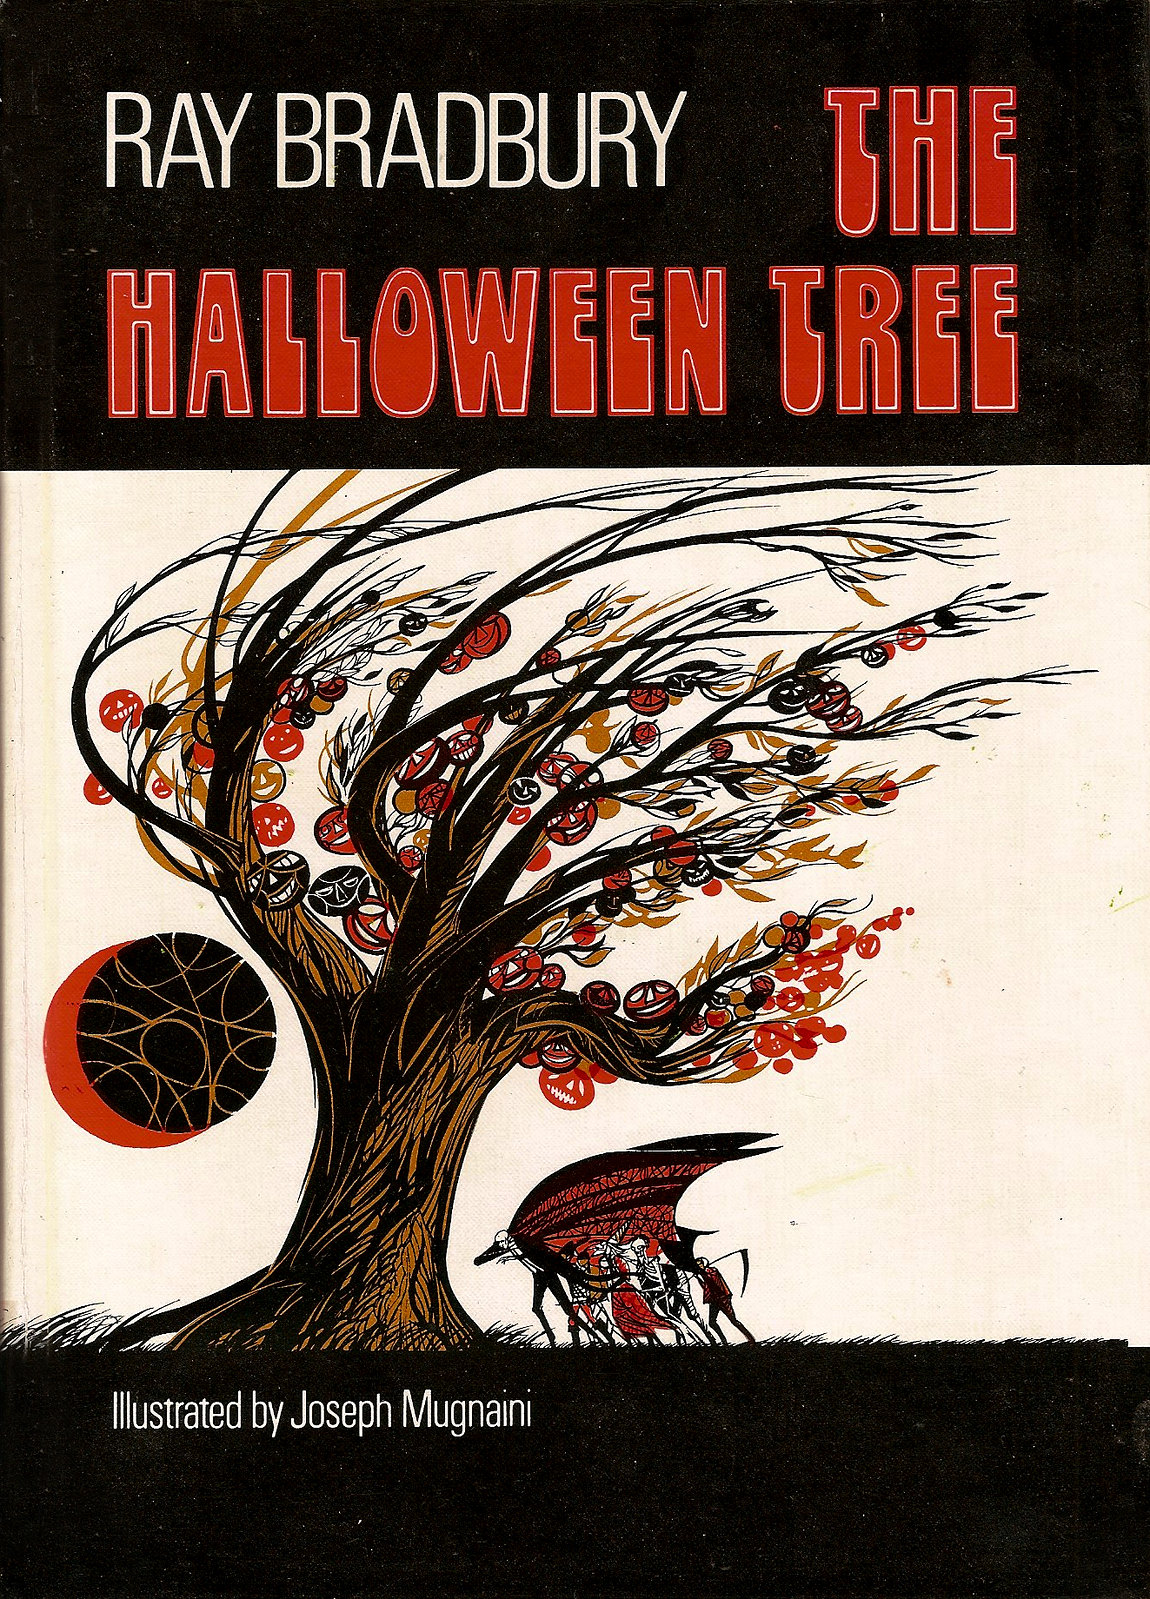 Joseph Mugnaini - Cover illustration from  The Halloween Tree, by Ray Bradbury, 1972